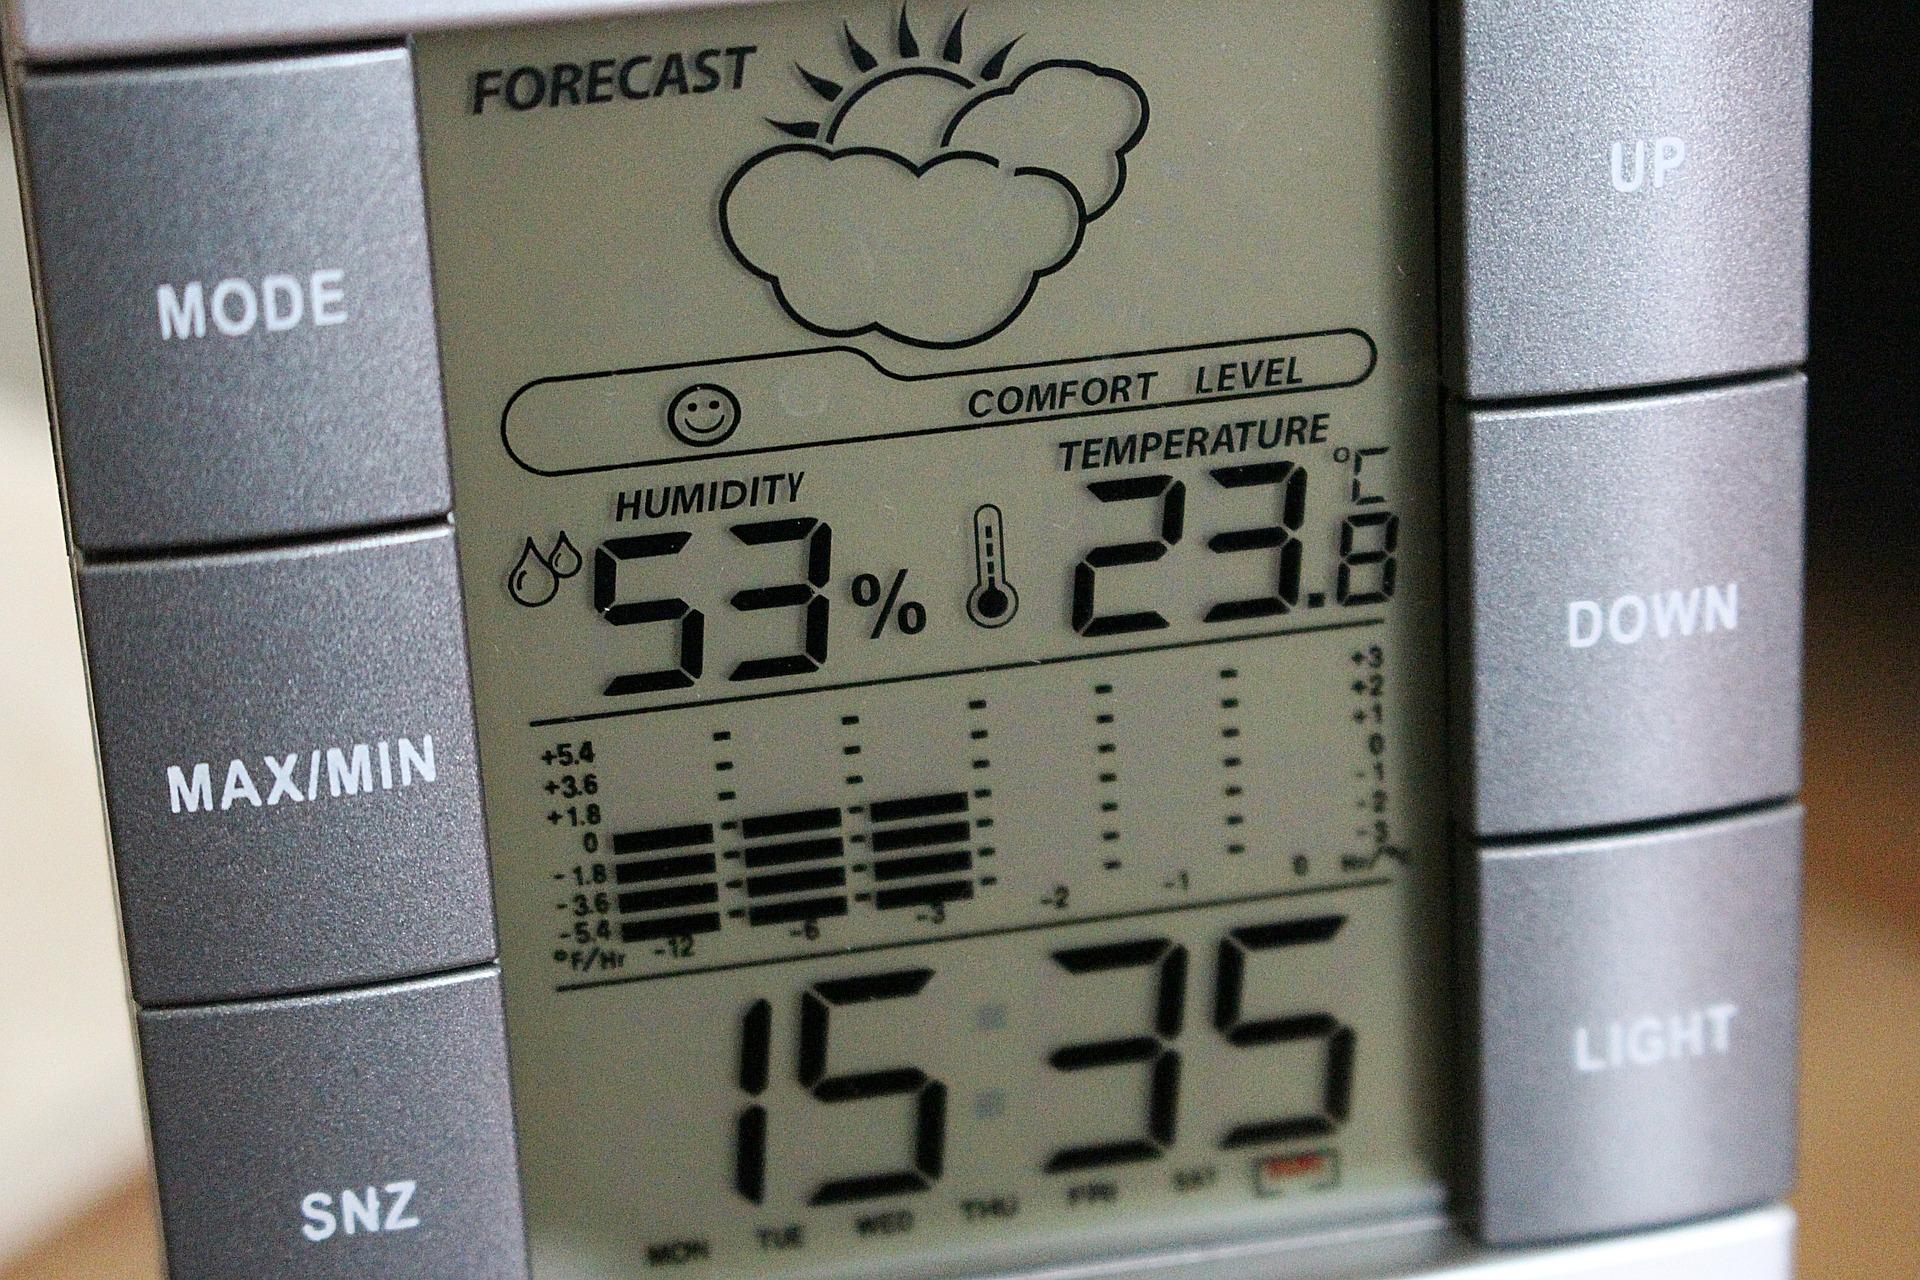 digitalna postaja s podatki o vremenu in vlagi v prostoru